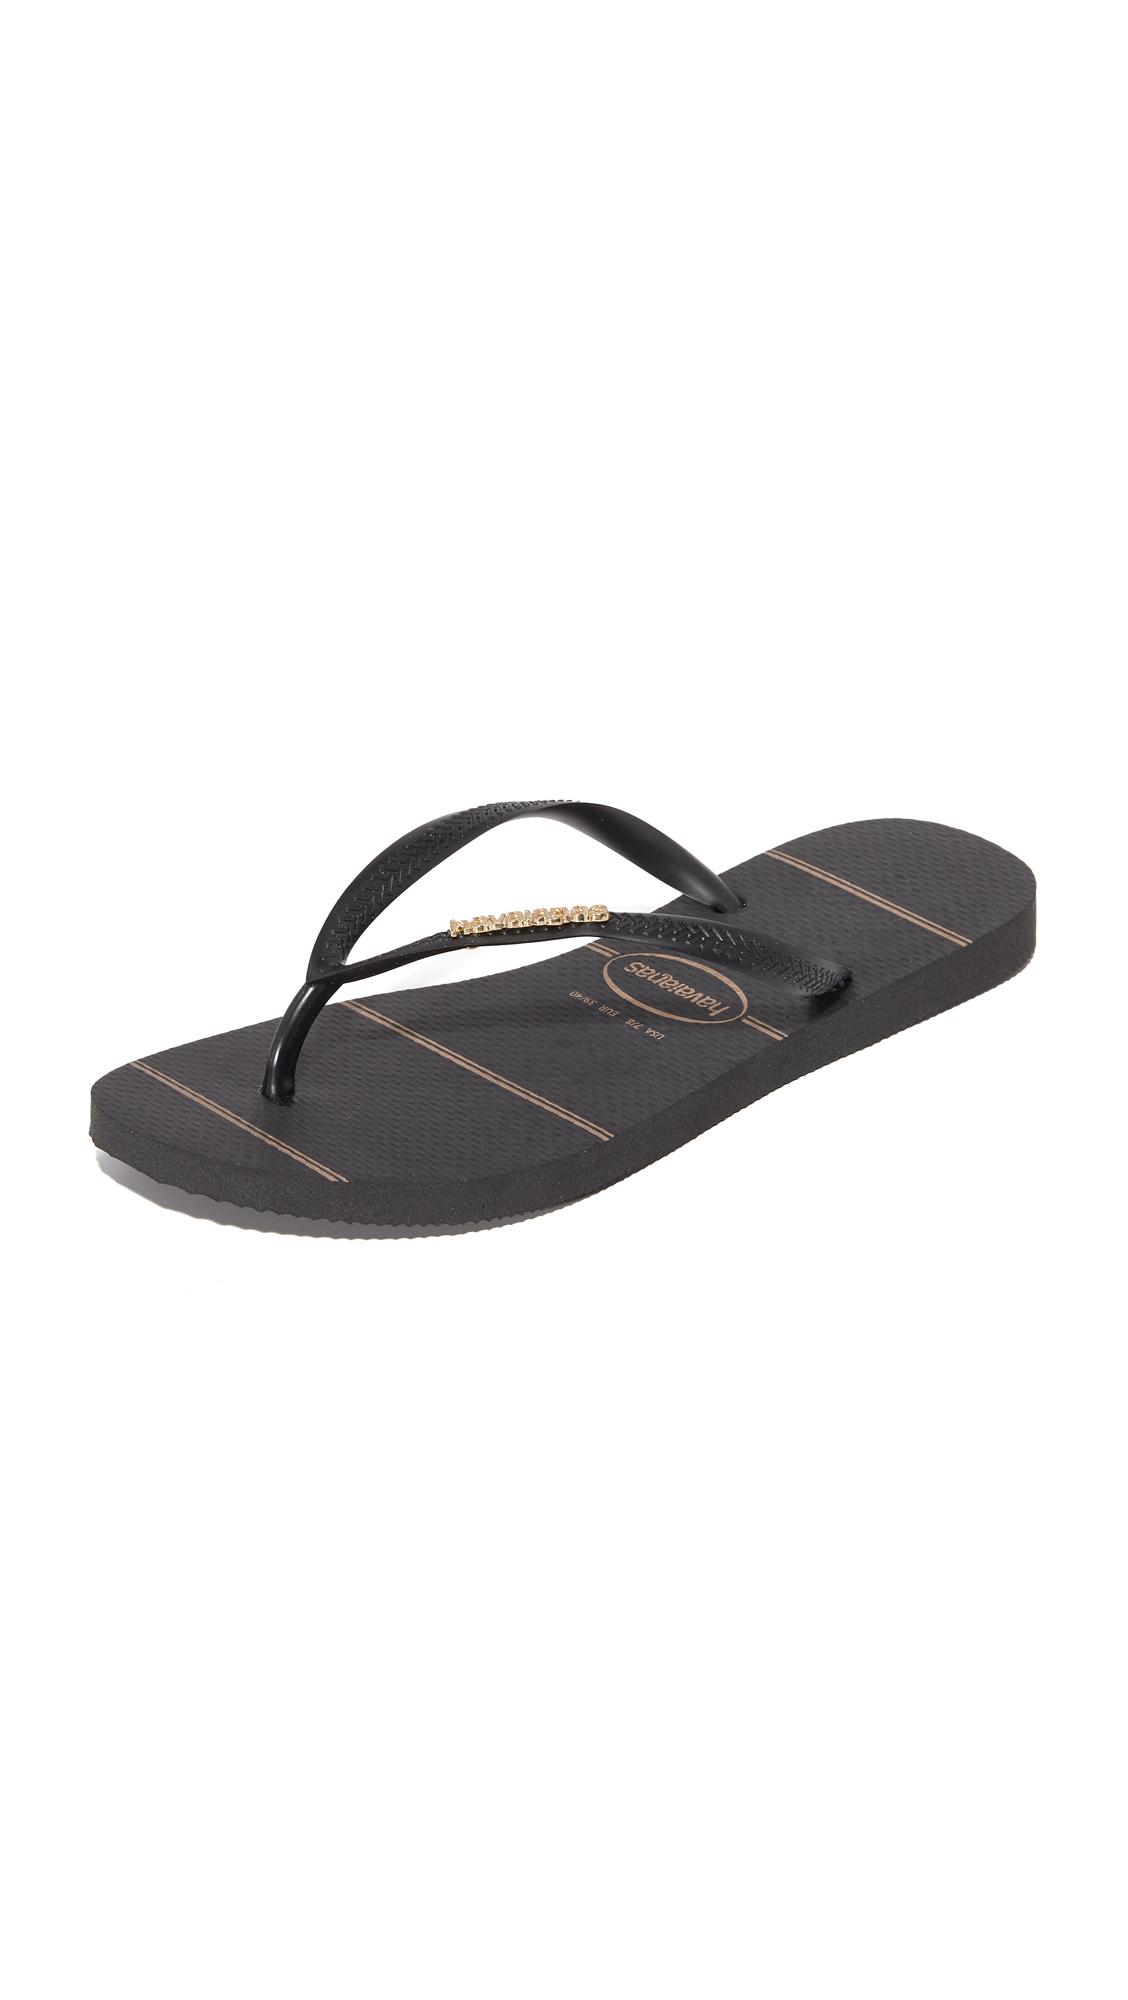 Havaianas Slim Logo Metallic Fine Lines Flip Flops - Black/Black at Shopbop